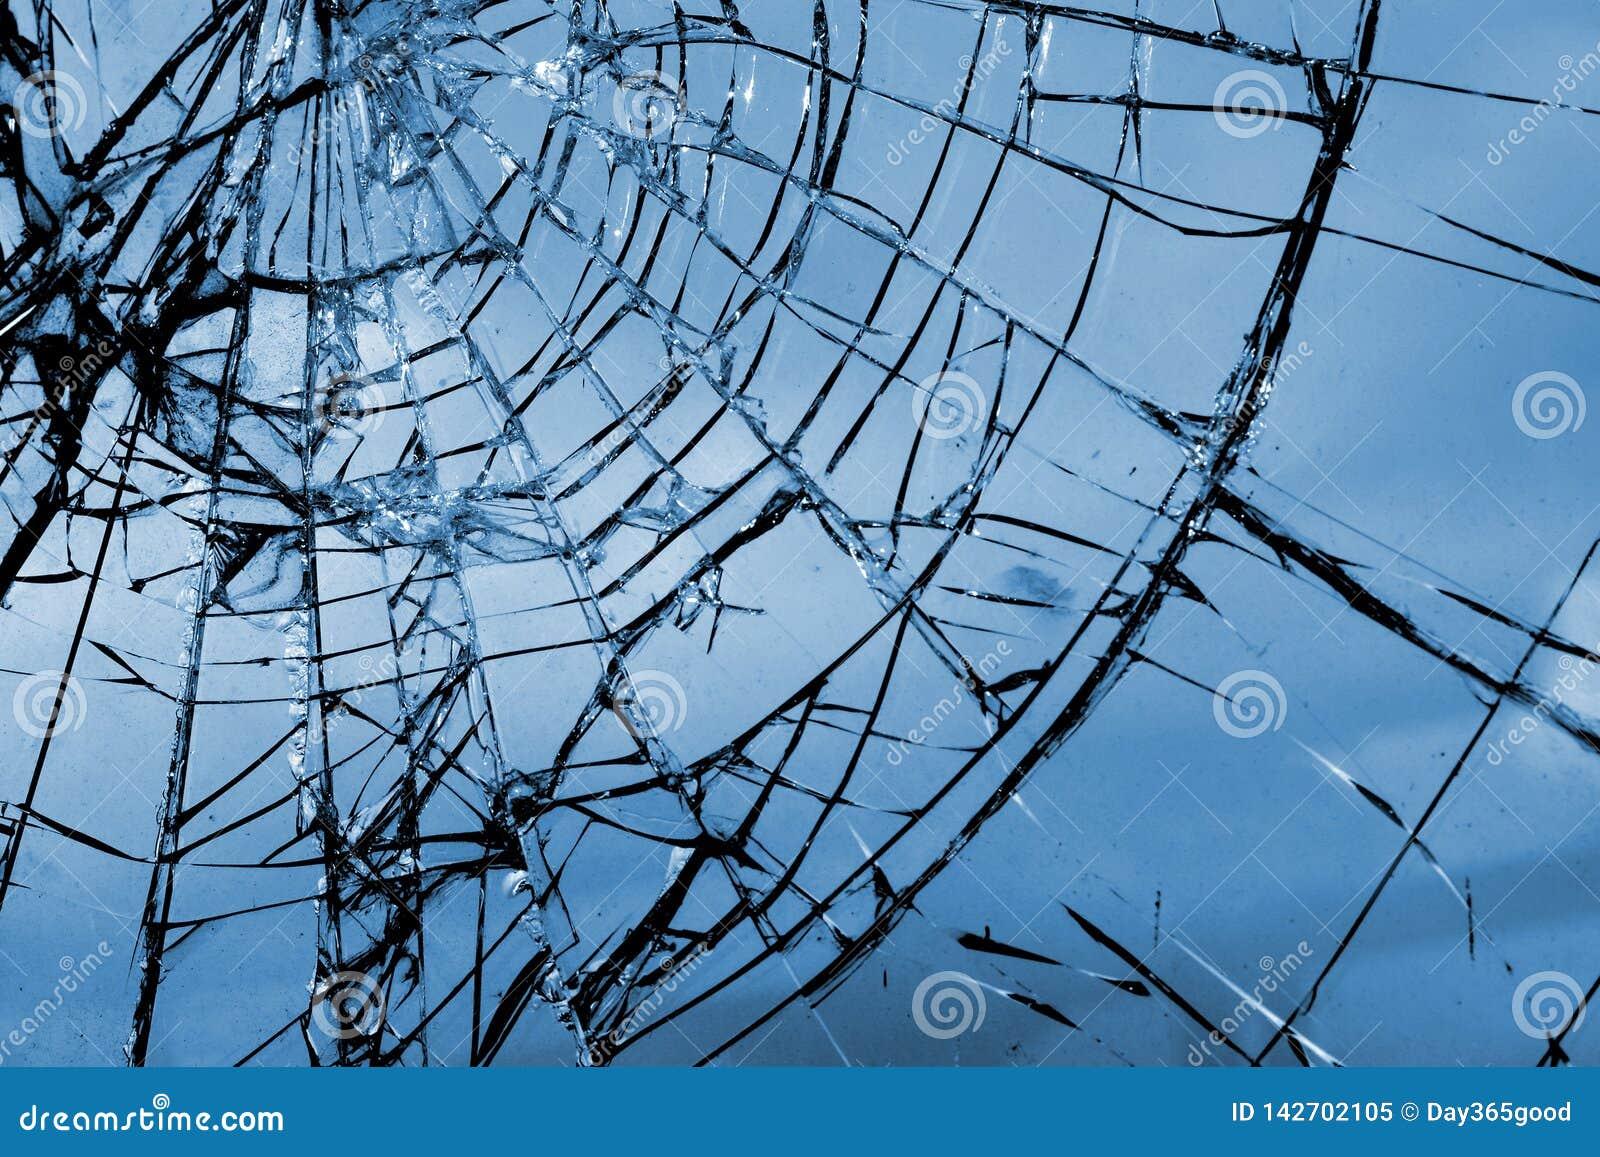 Broken glass. Grid cracks on the glass like cobwebs